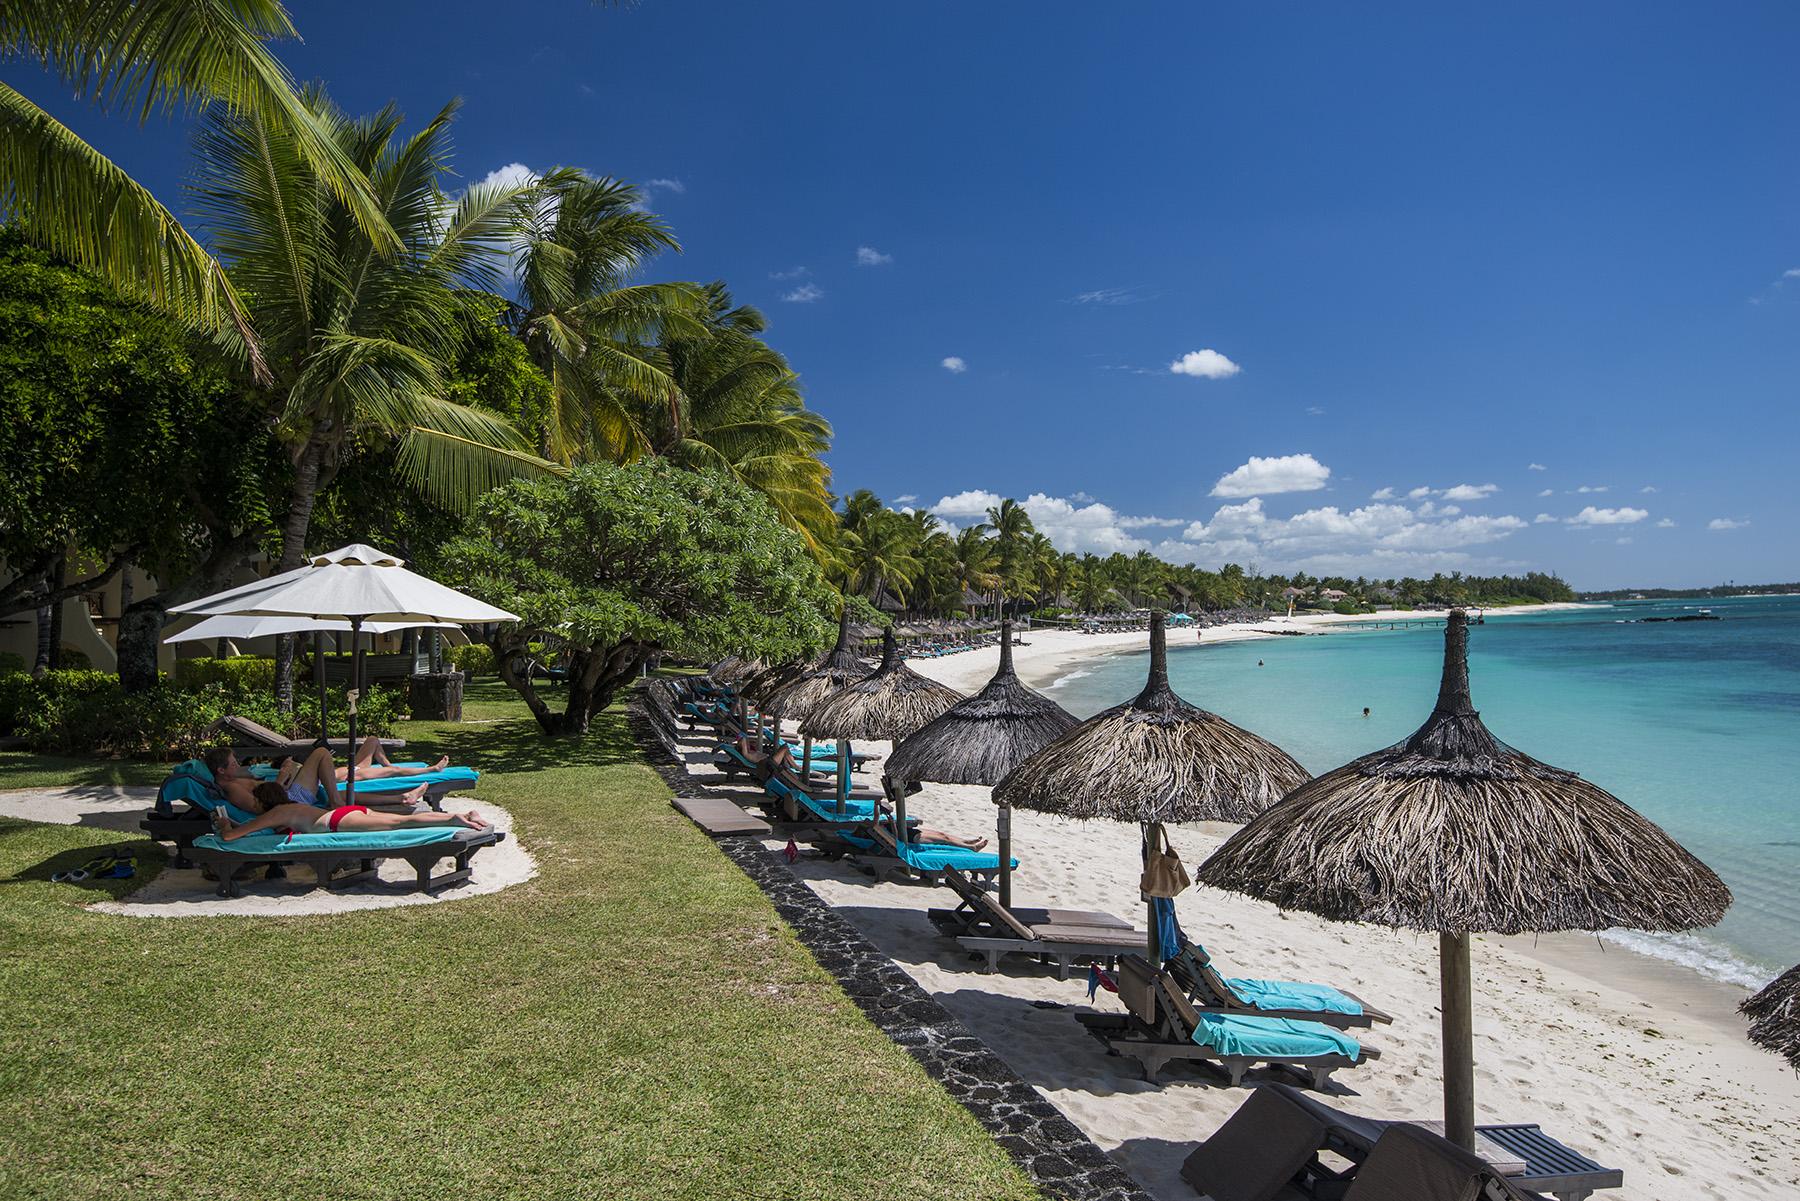 mauritius_belle-mare-plage_beach-2